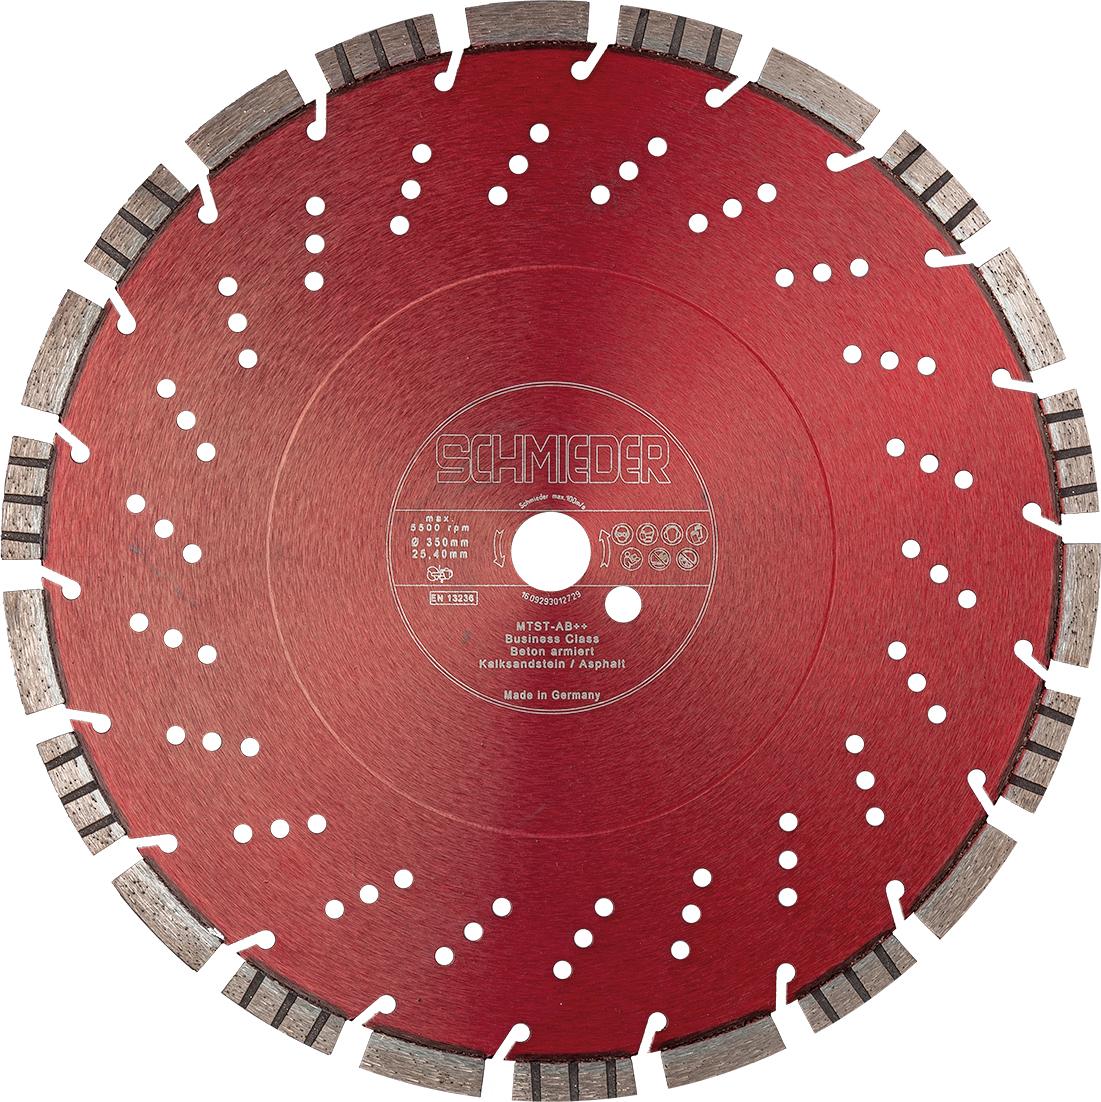 DIAREX Trennscheibe MTST-AB++ ø 300 mm | Bohrung 20 mm